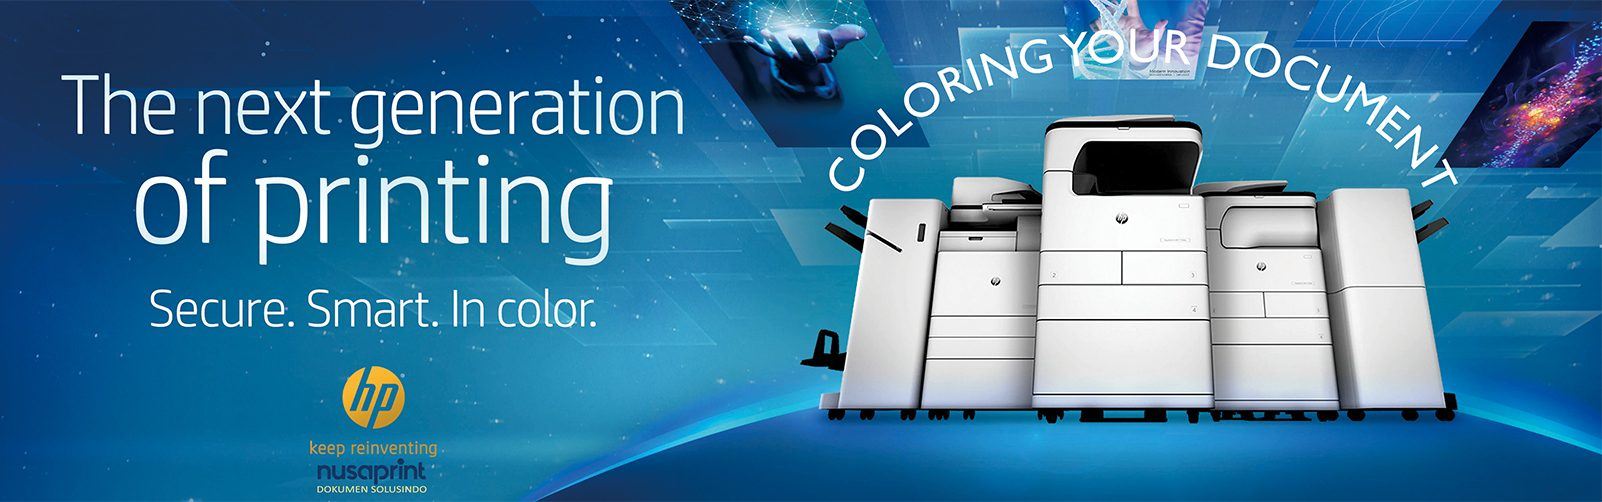 Kelebihan dan kekurangan mesin printer inject